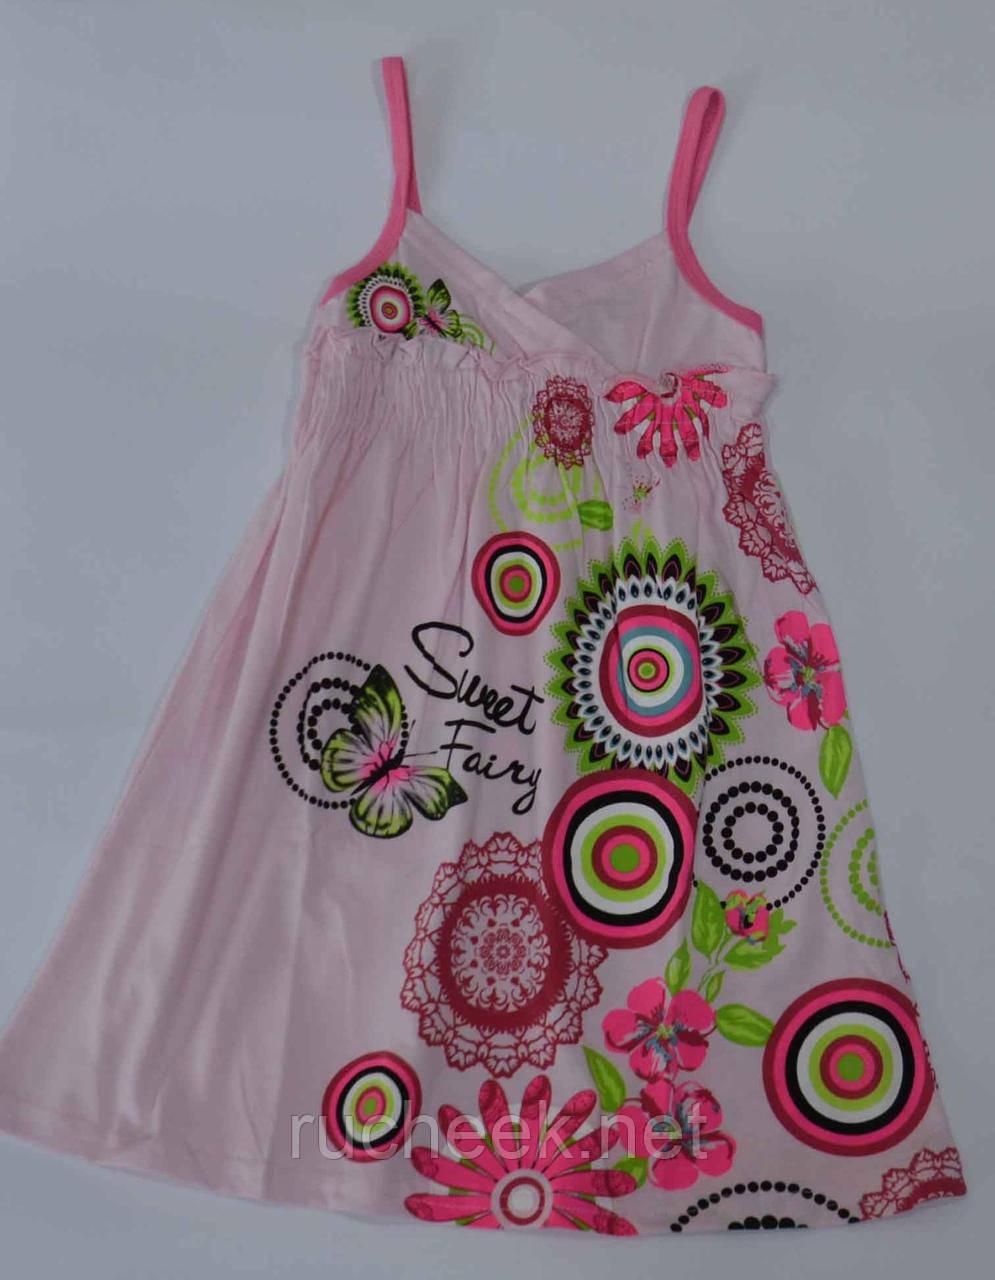 Сарафан для девочки в комплекте с болеро р-р 98, ТМ Sincere CJ-1501